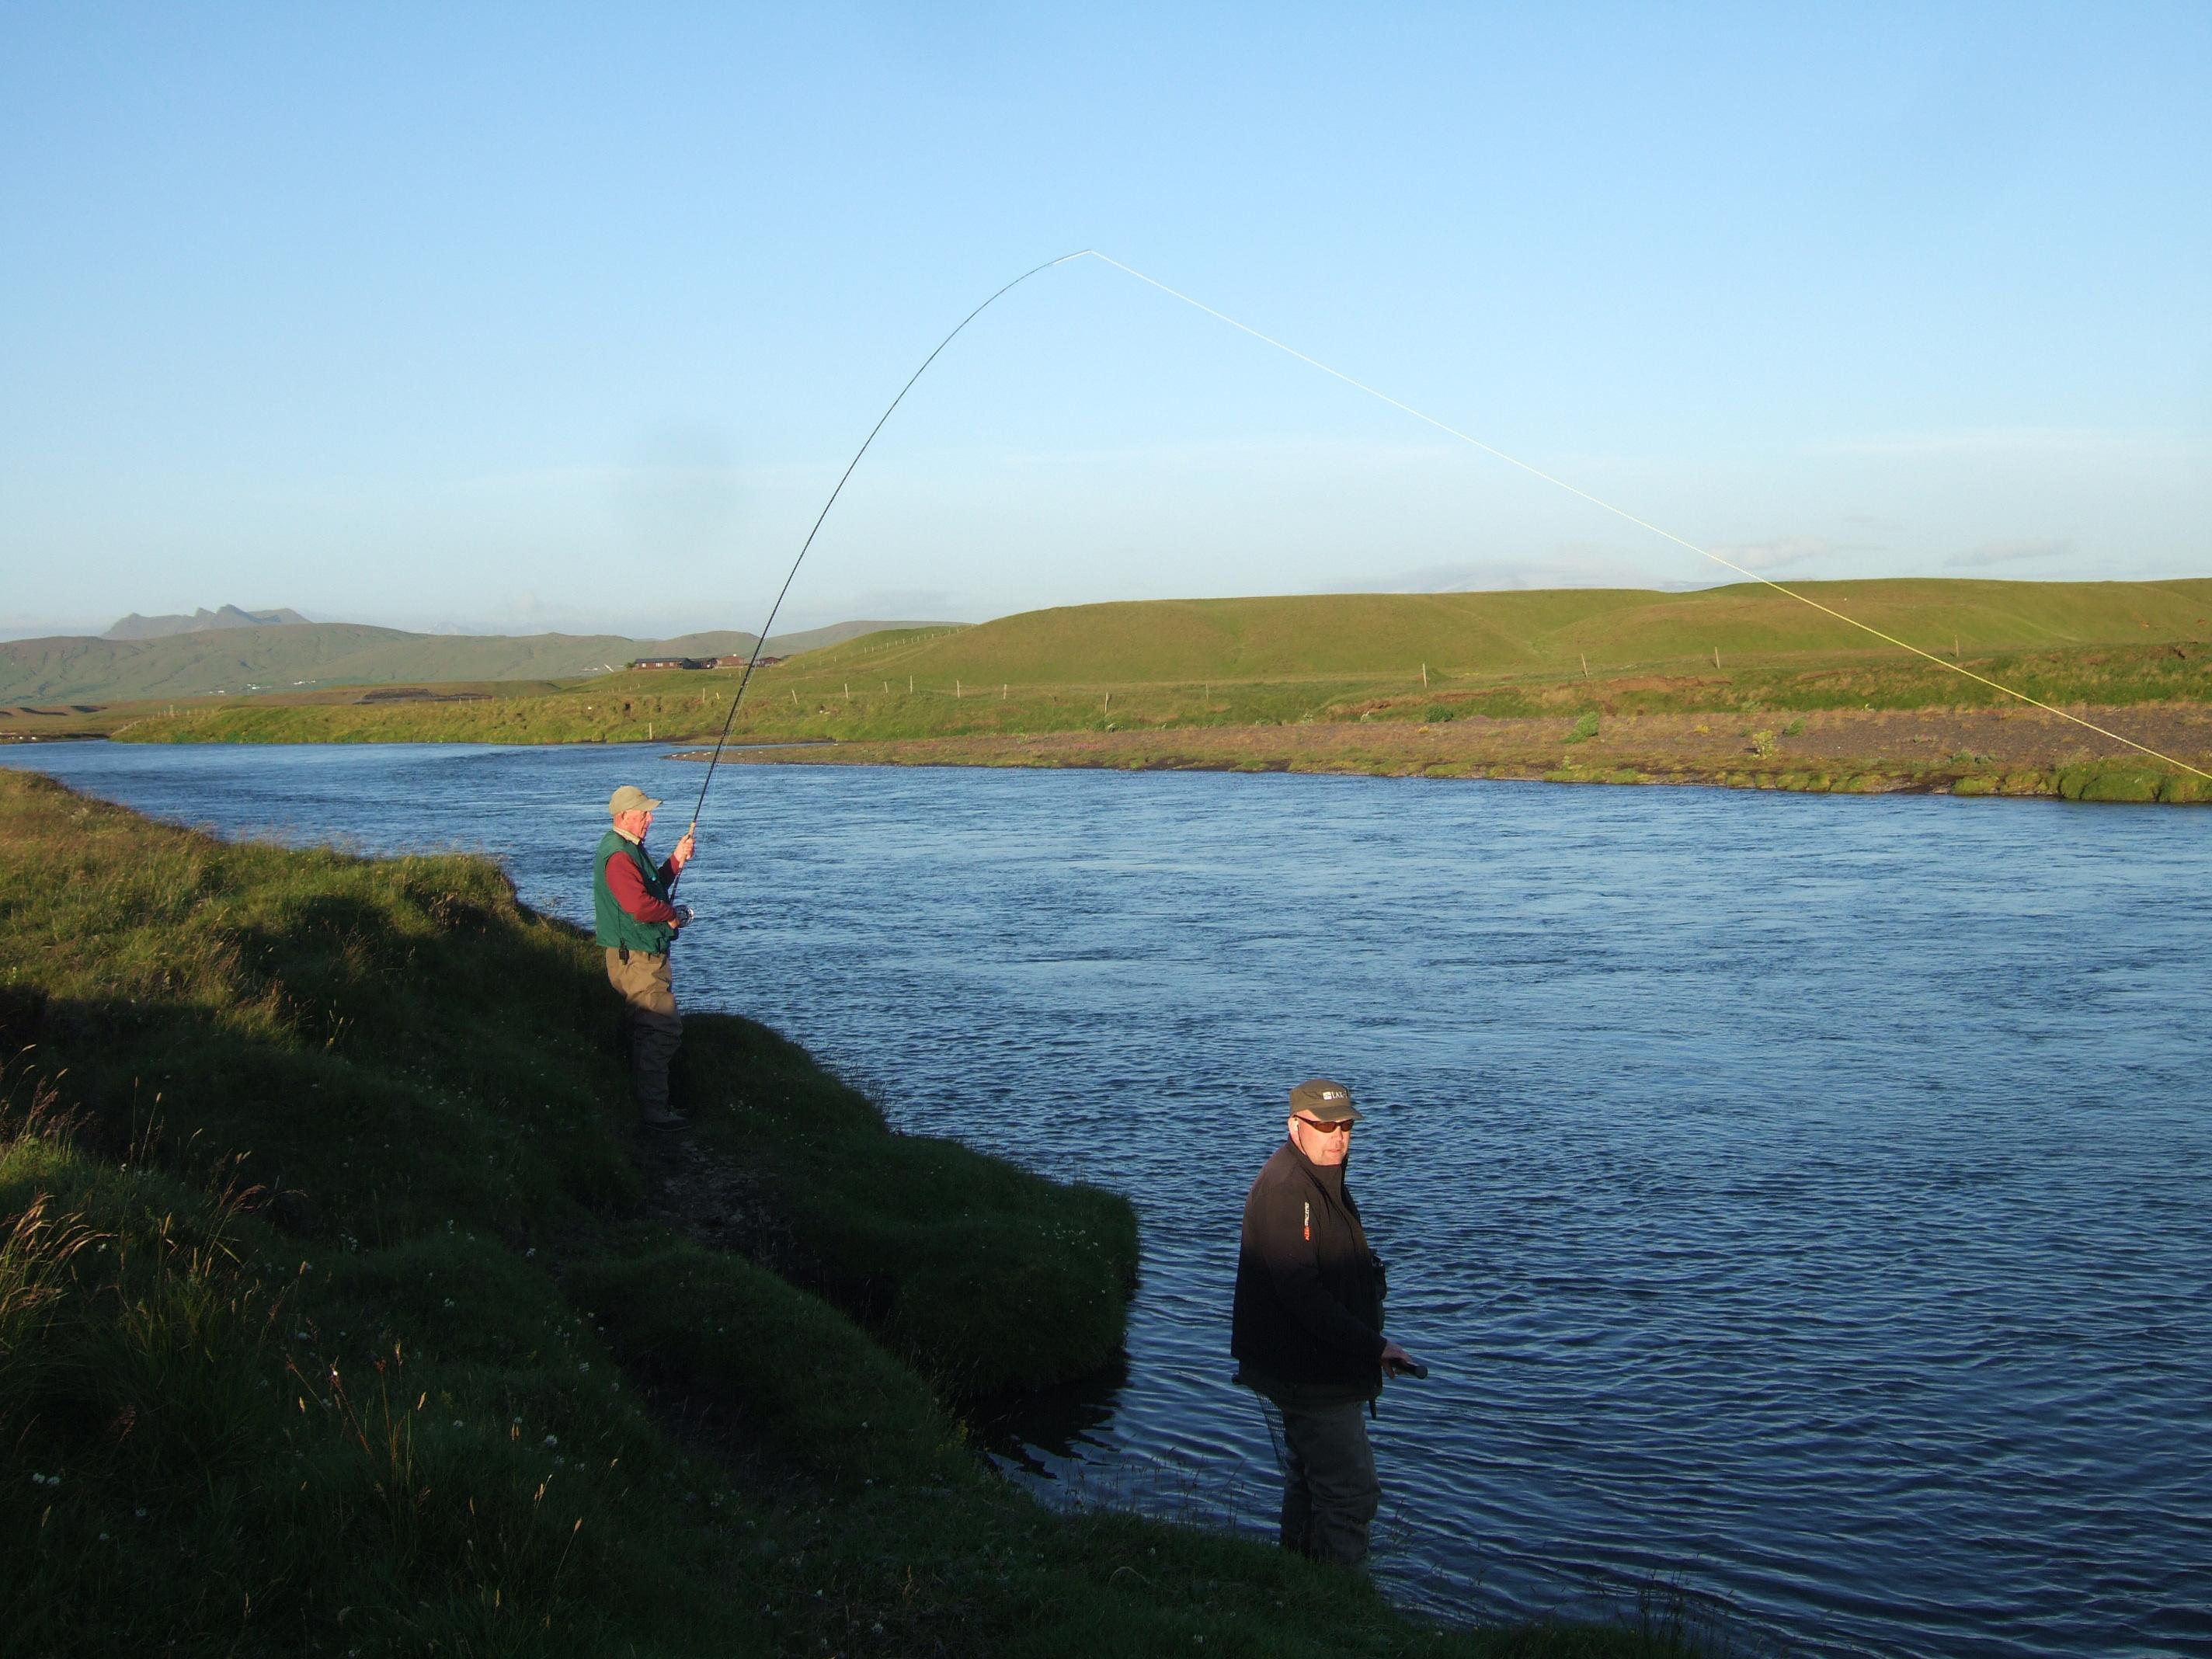 East ranga iceland salmon fishing short break bg 27th for Salmon fishing colorado